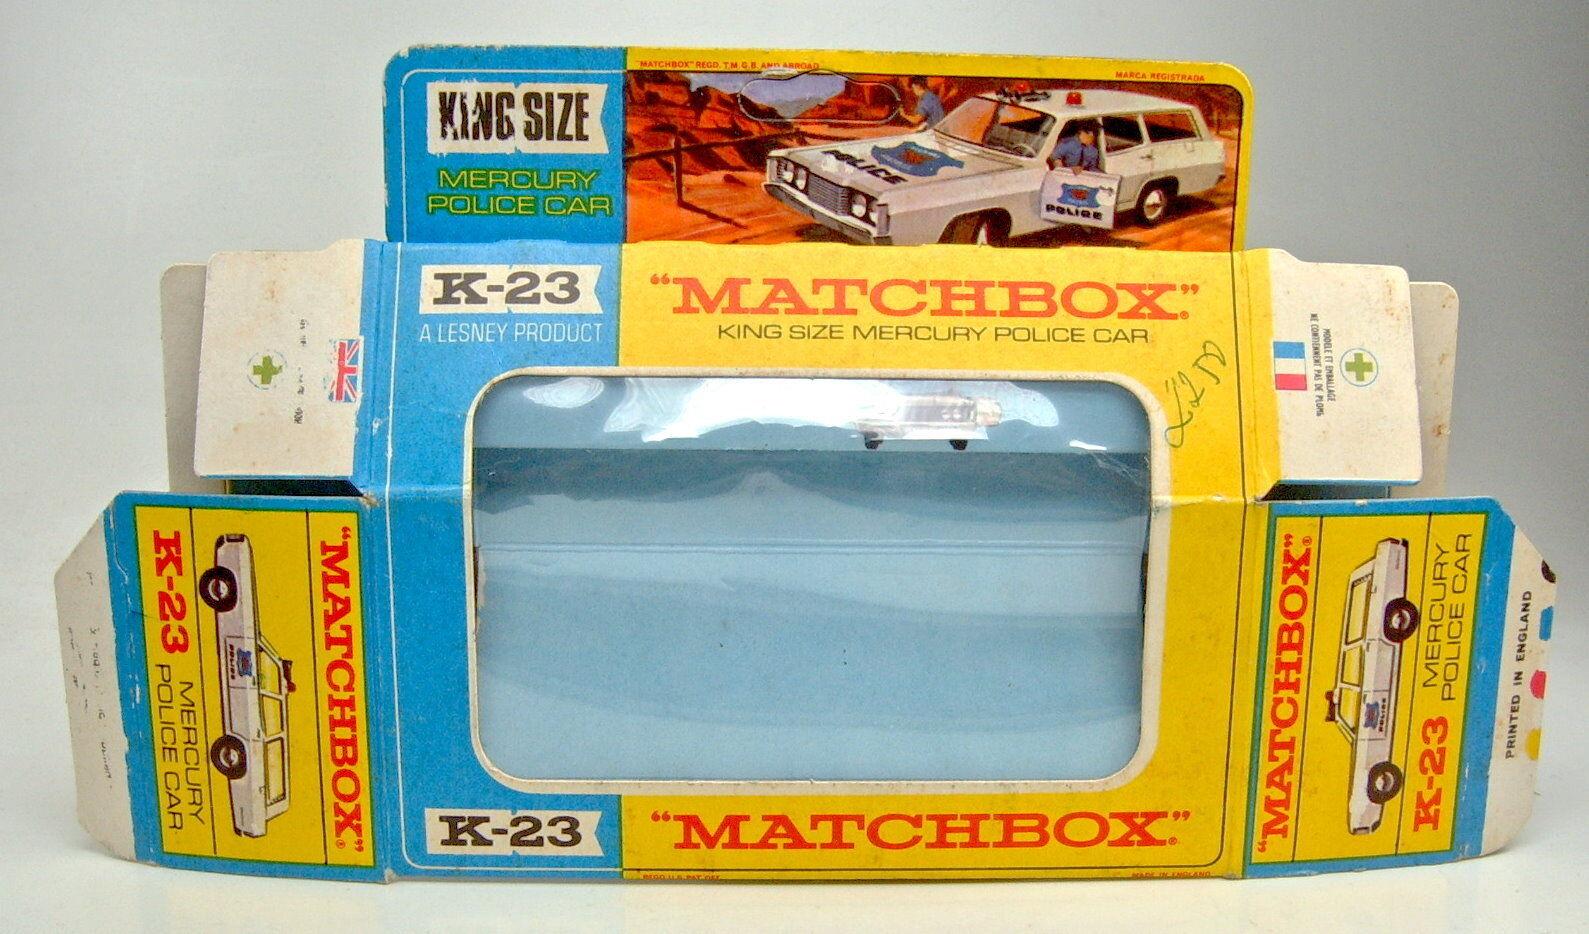 Matchbox KingTaille k-23a Mercury Police car vide Box